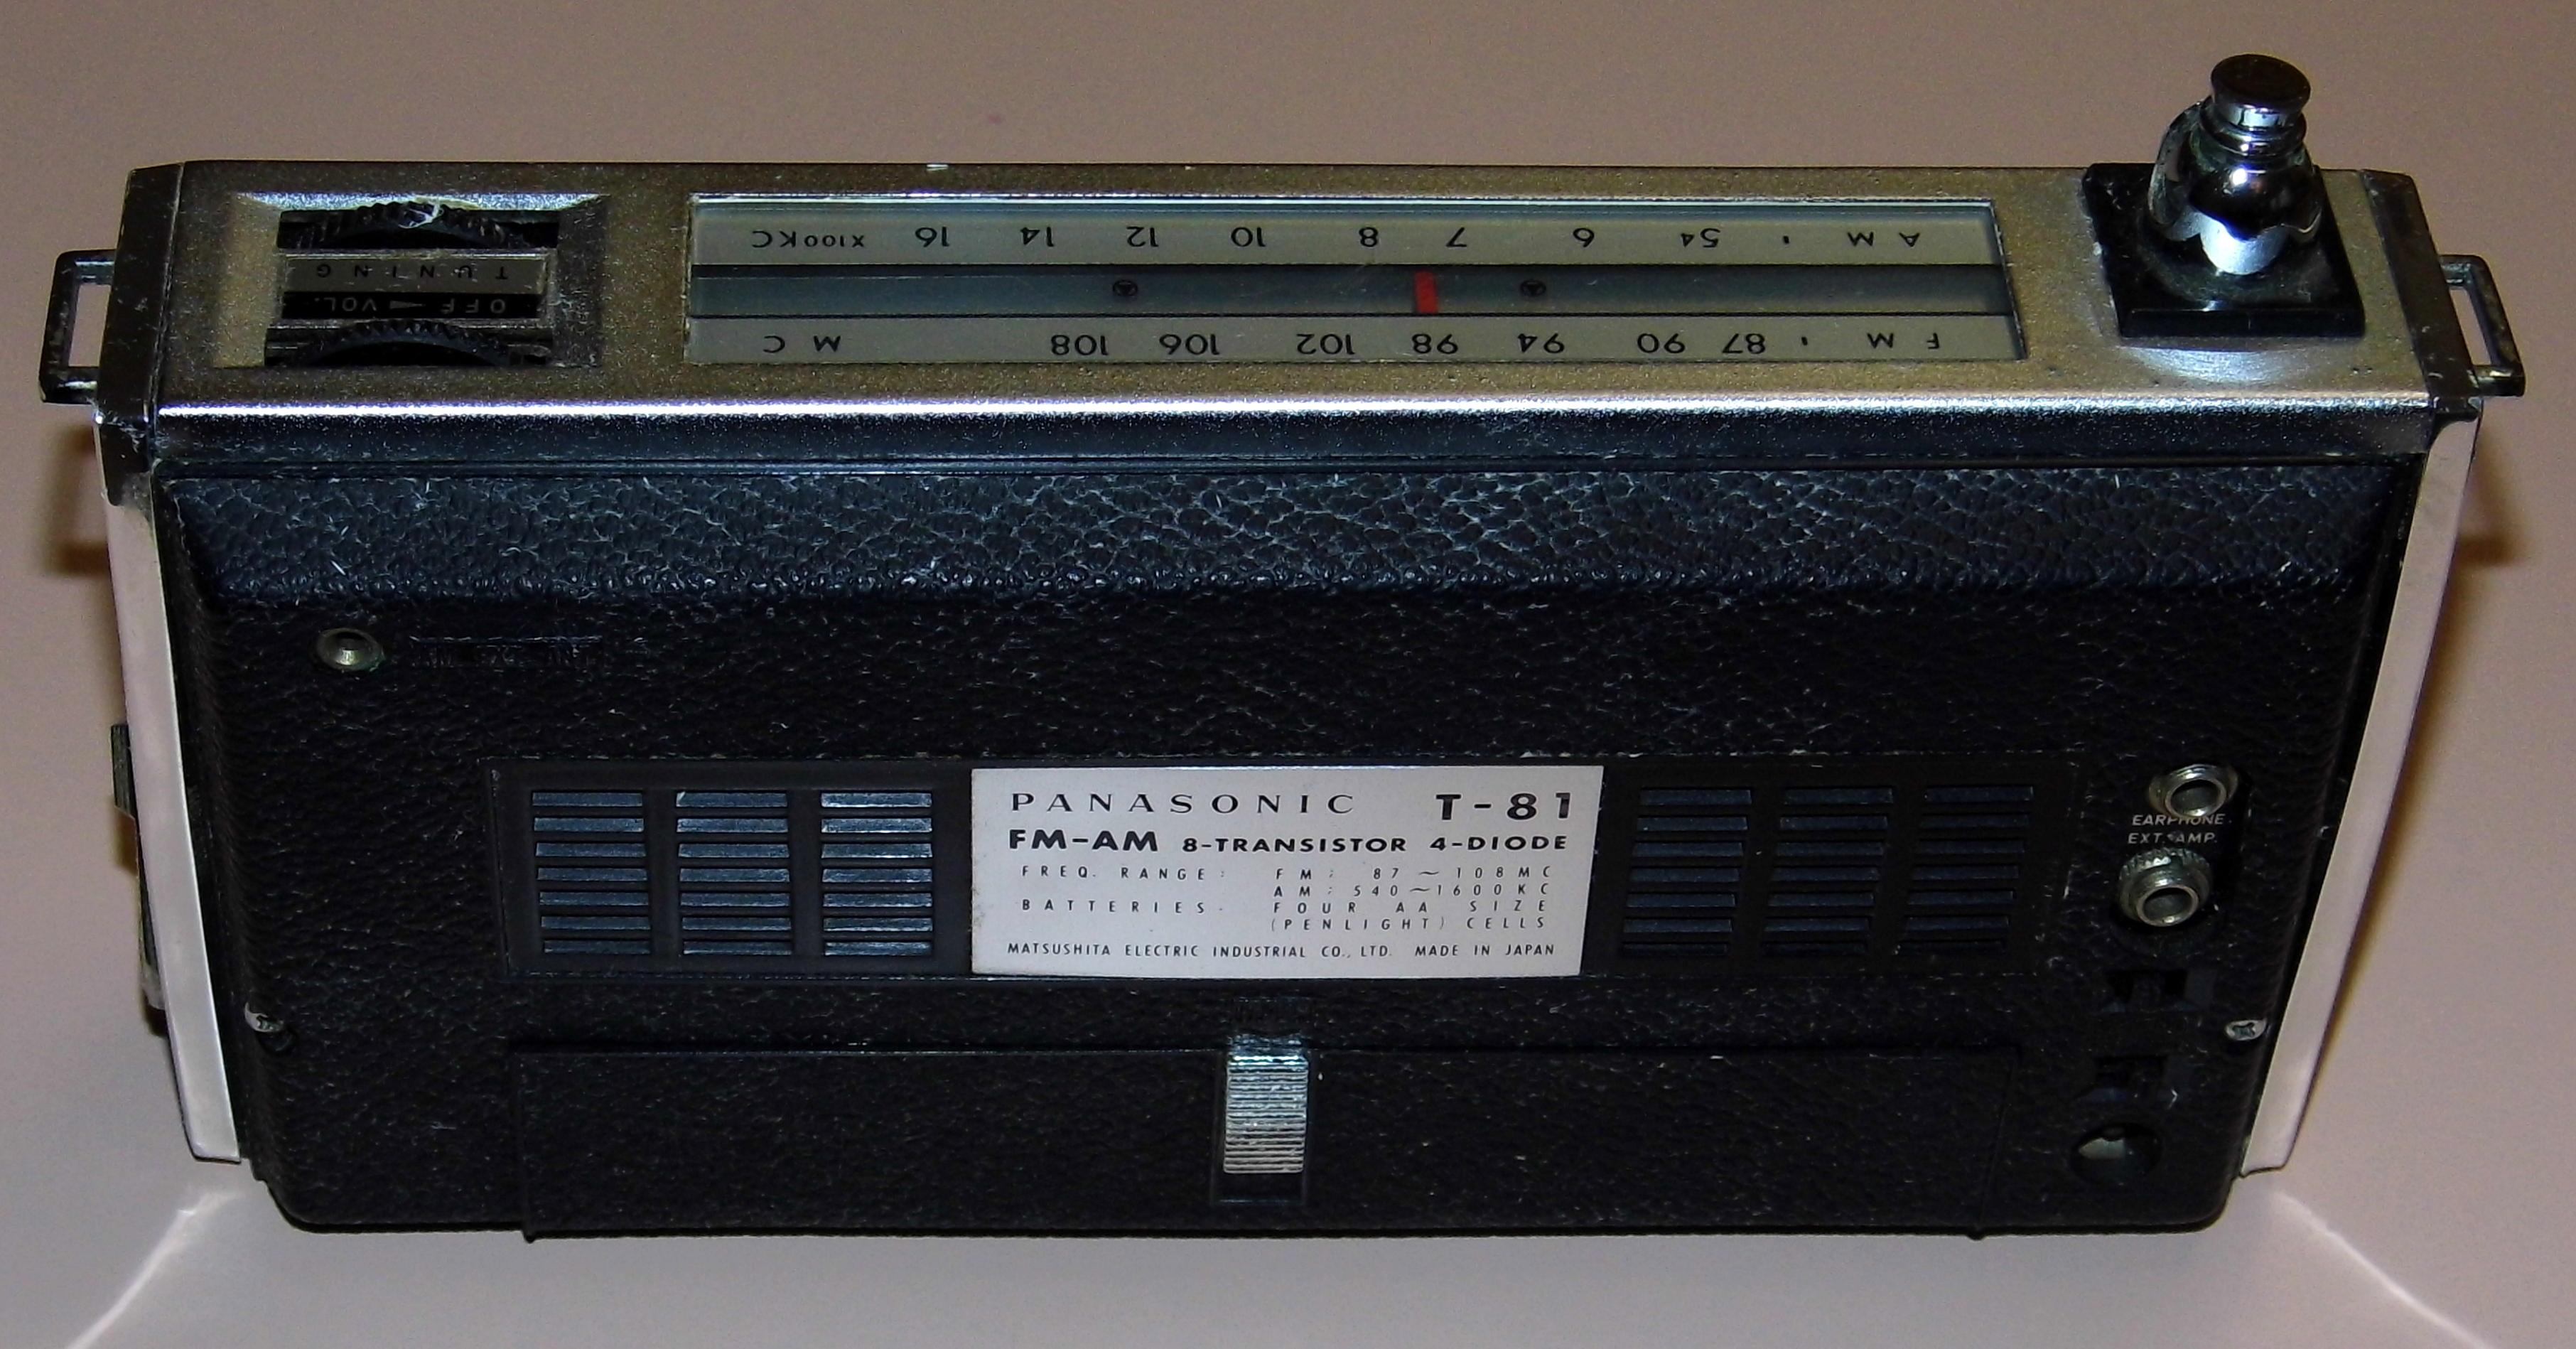 file vintage panasonic 8 transistor radio model t 81 two band fm rh commons wikimedia org